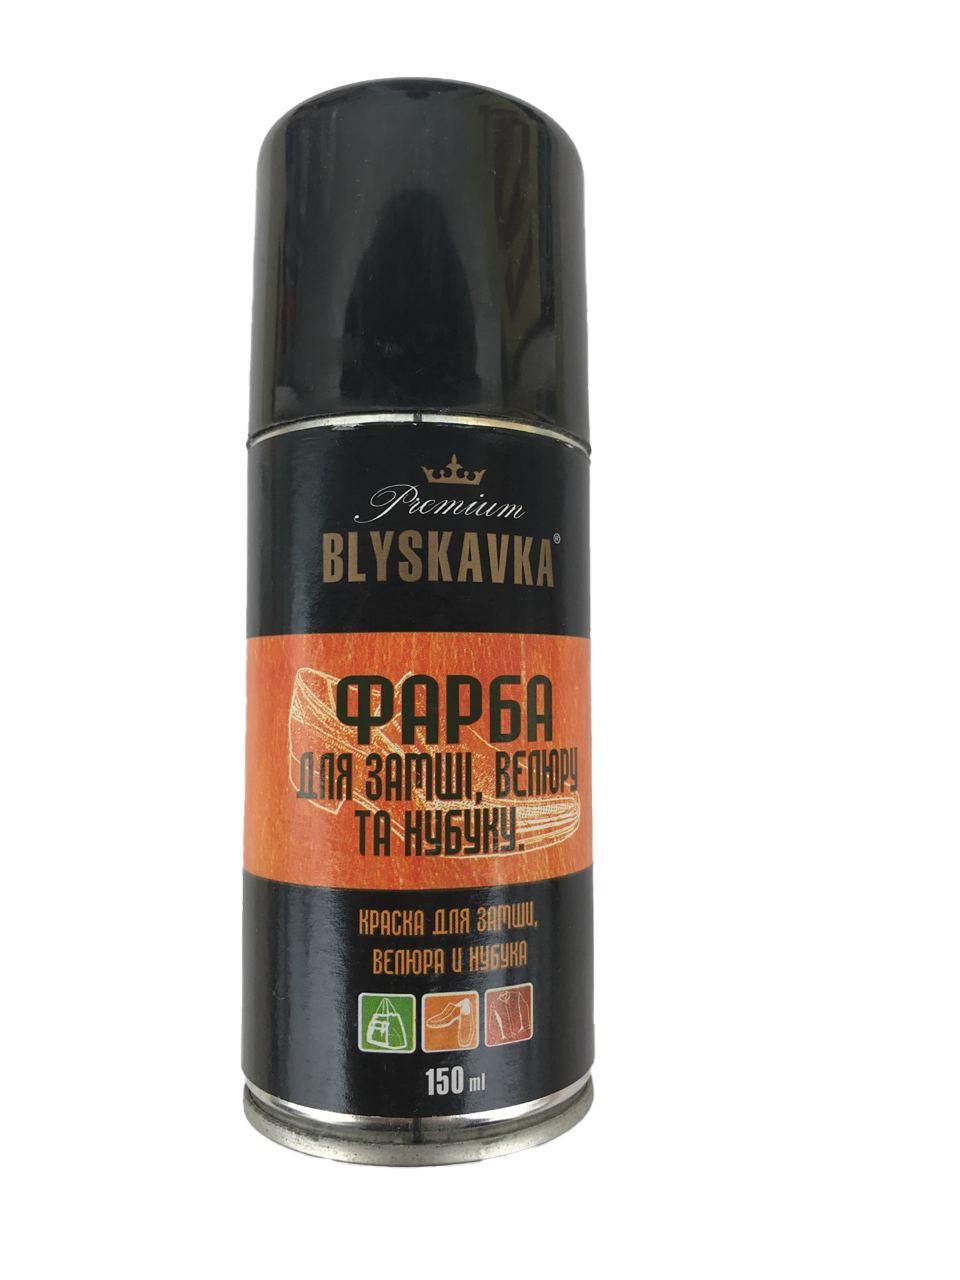 Краска для замши велюра и нубука Blyskavka 150 мл темно-коричневая